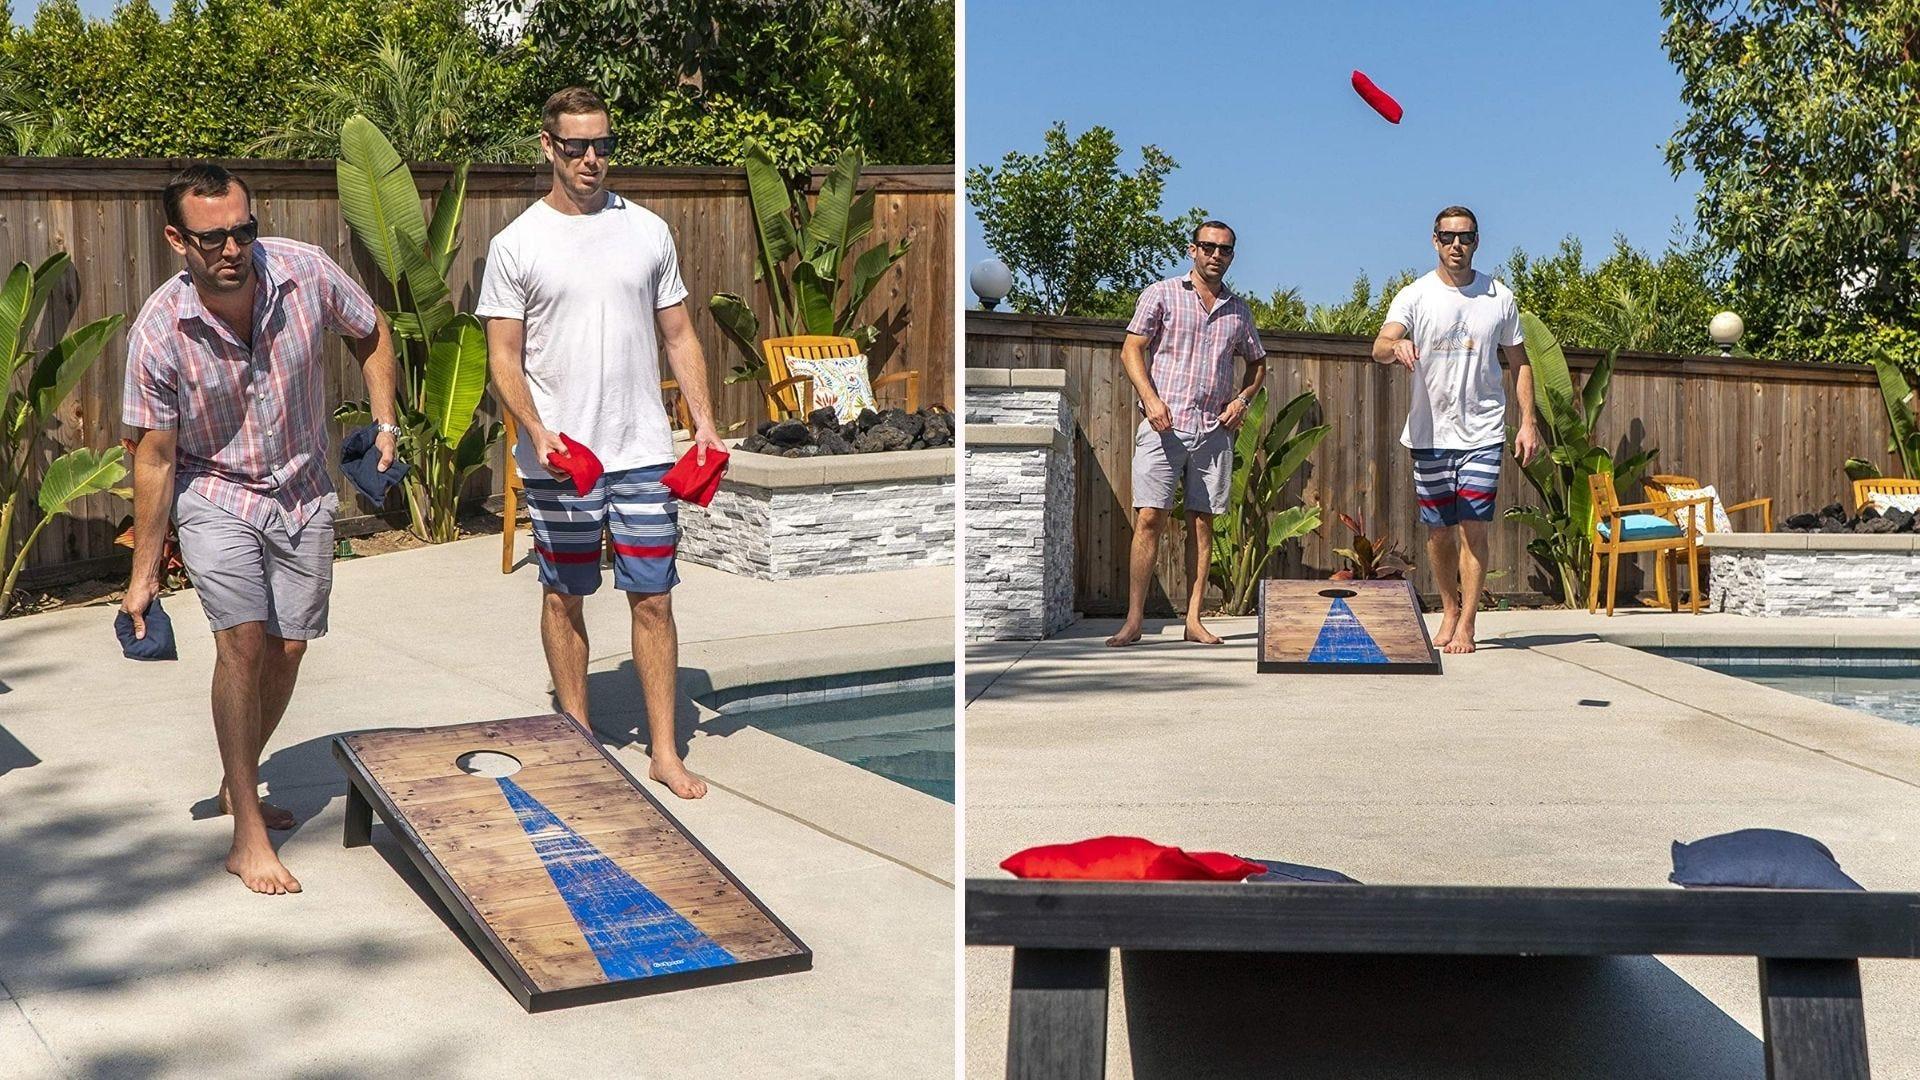 Two men playing cornhole on a pool patio